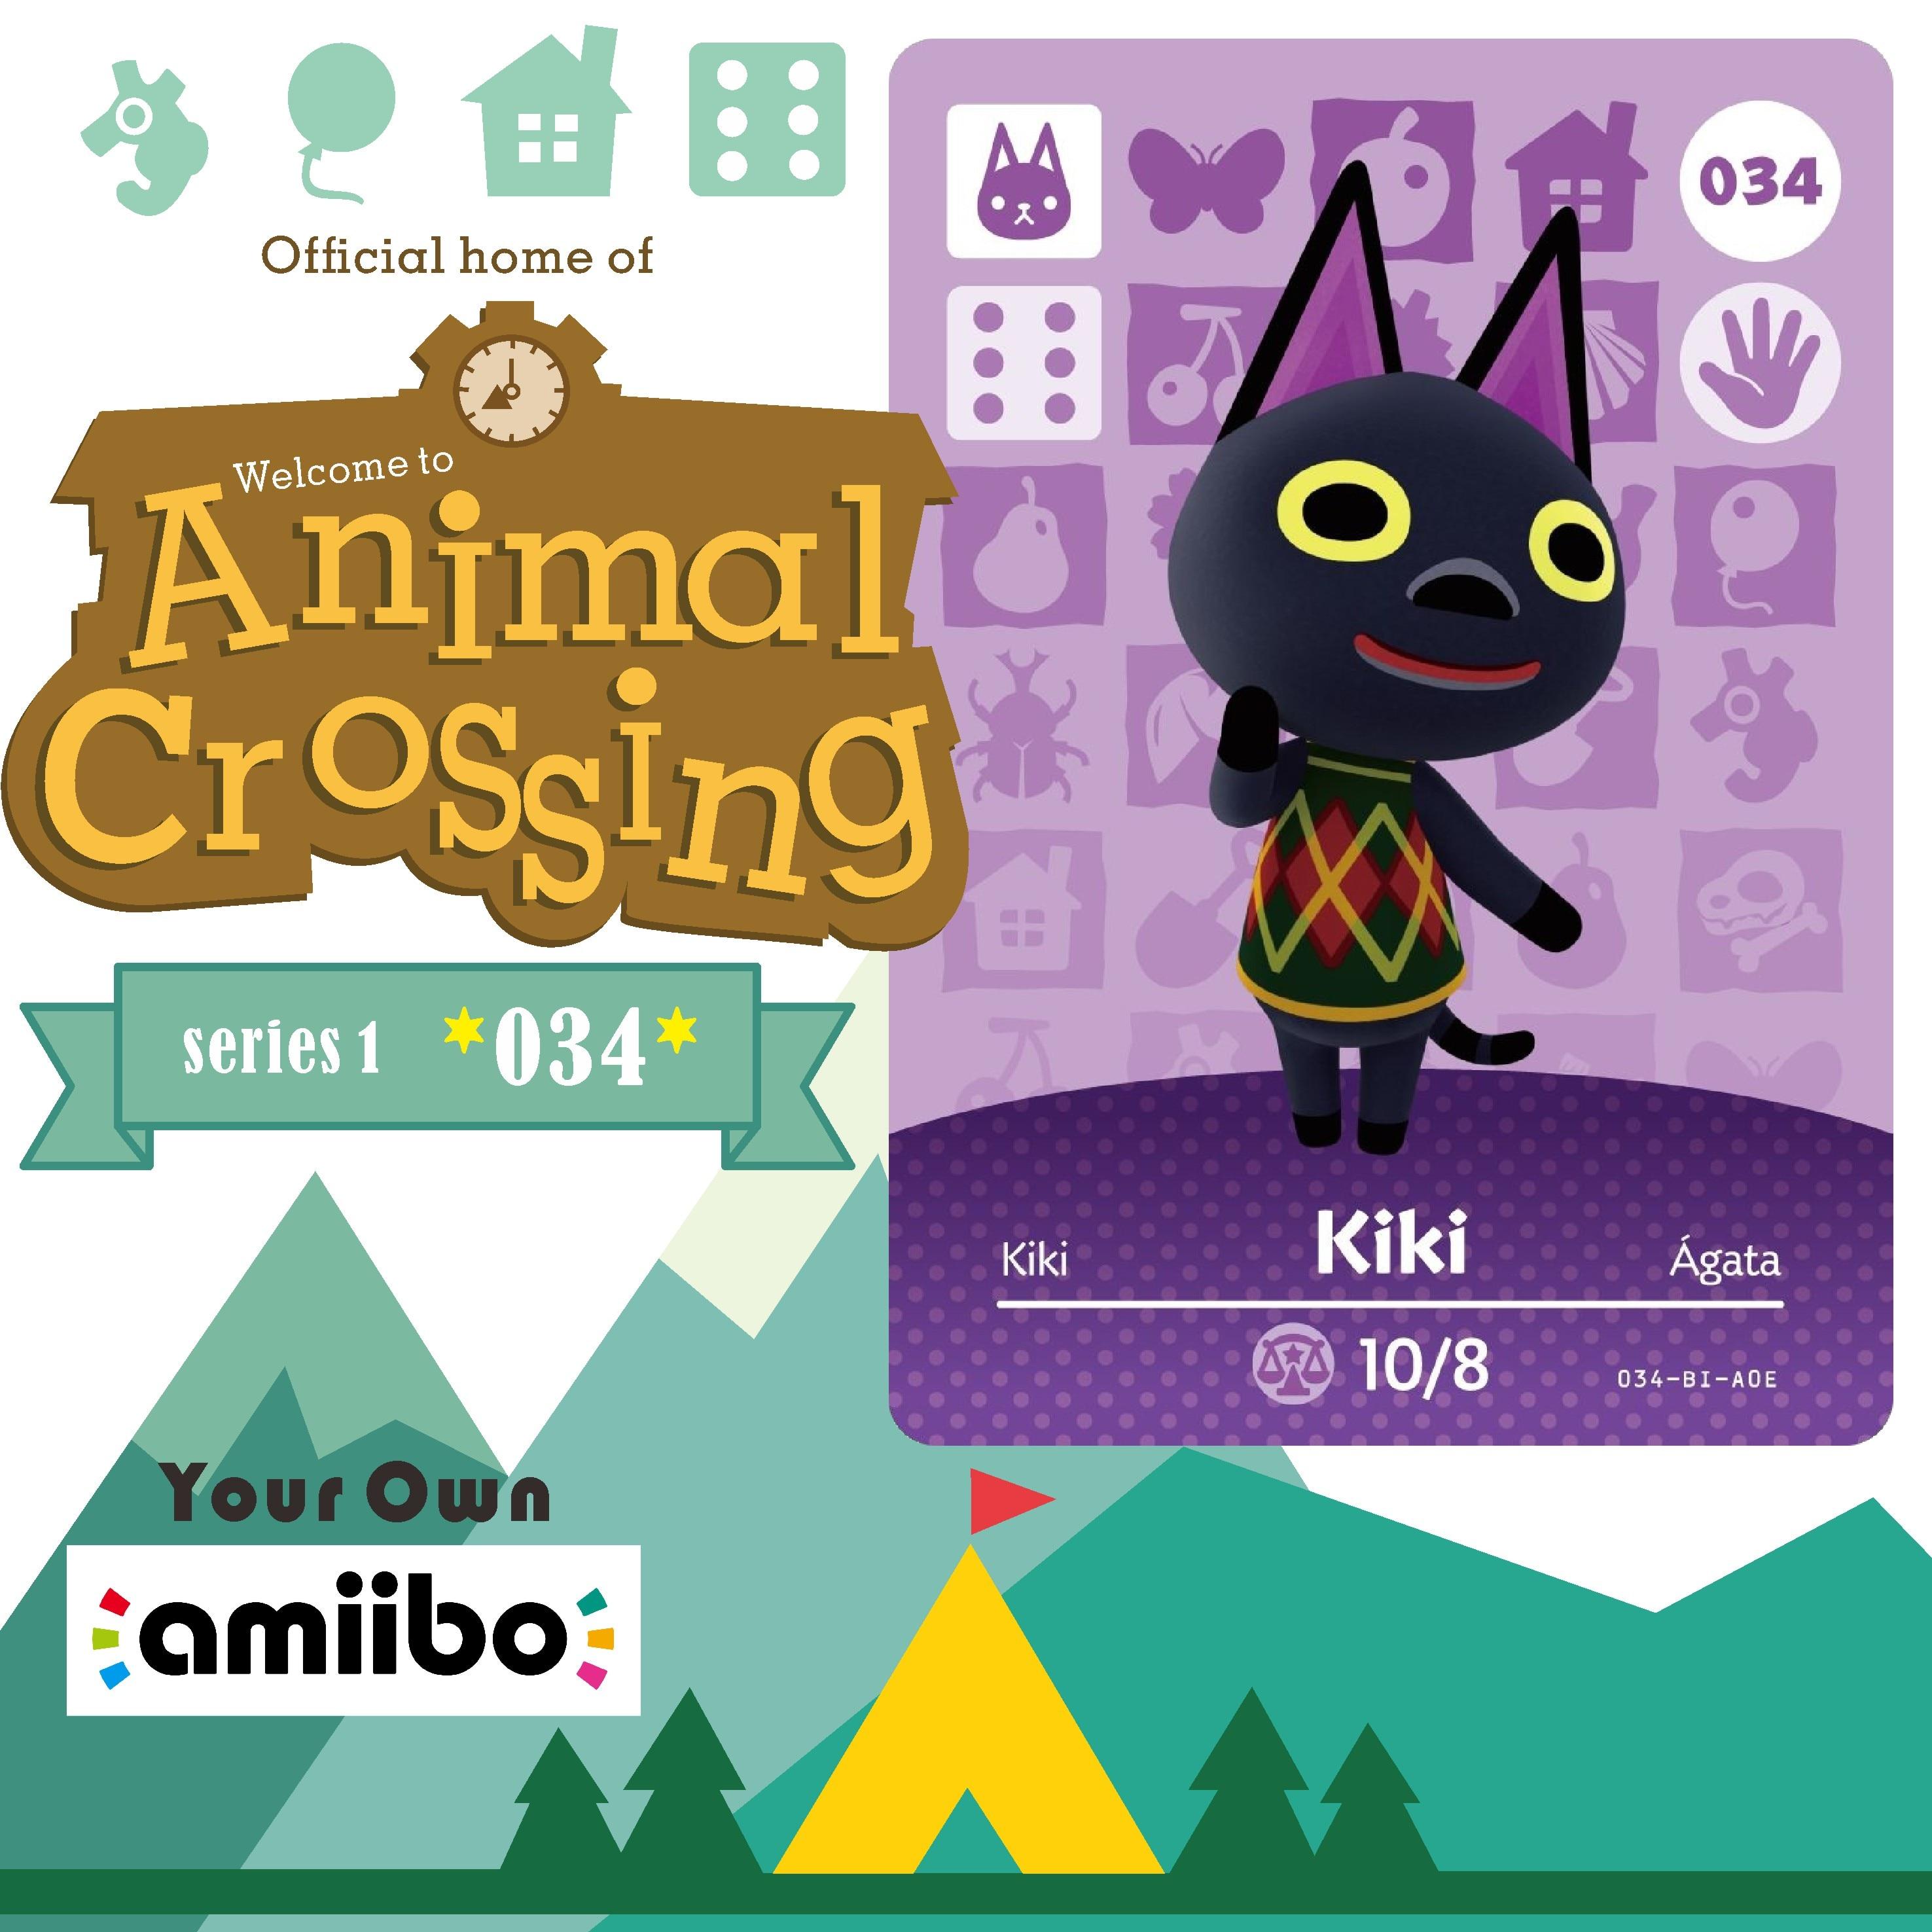 034 Kiki Amiibo Animal Crossing Series 1 Animal Crossing Amiibo Card Work For Ns Games Amiibo Nfc Card Dropshipping